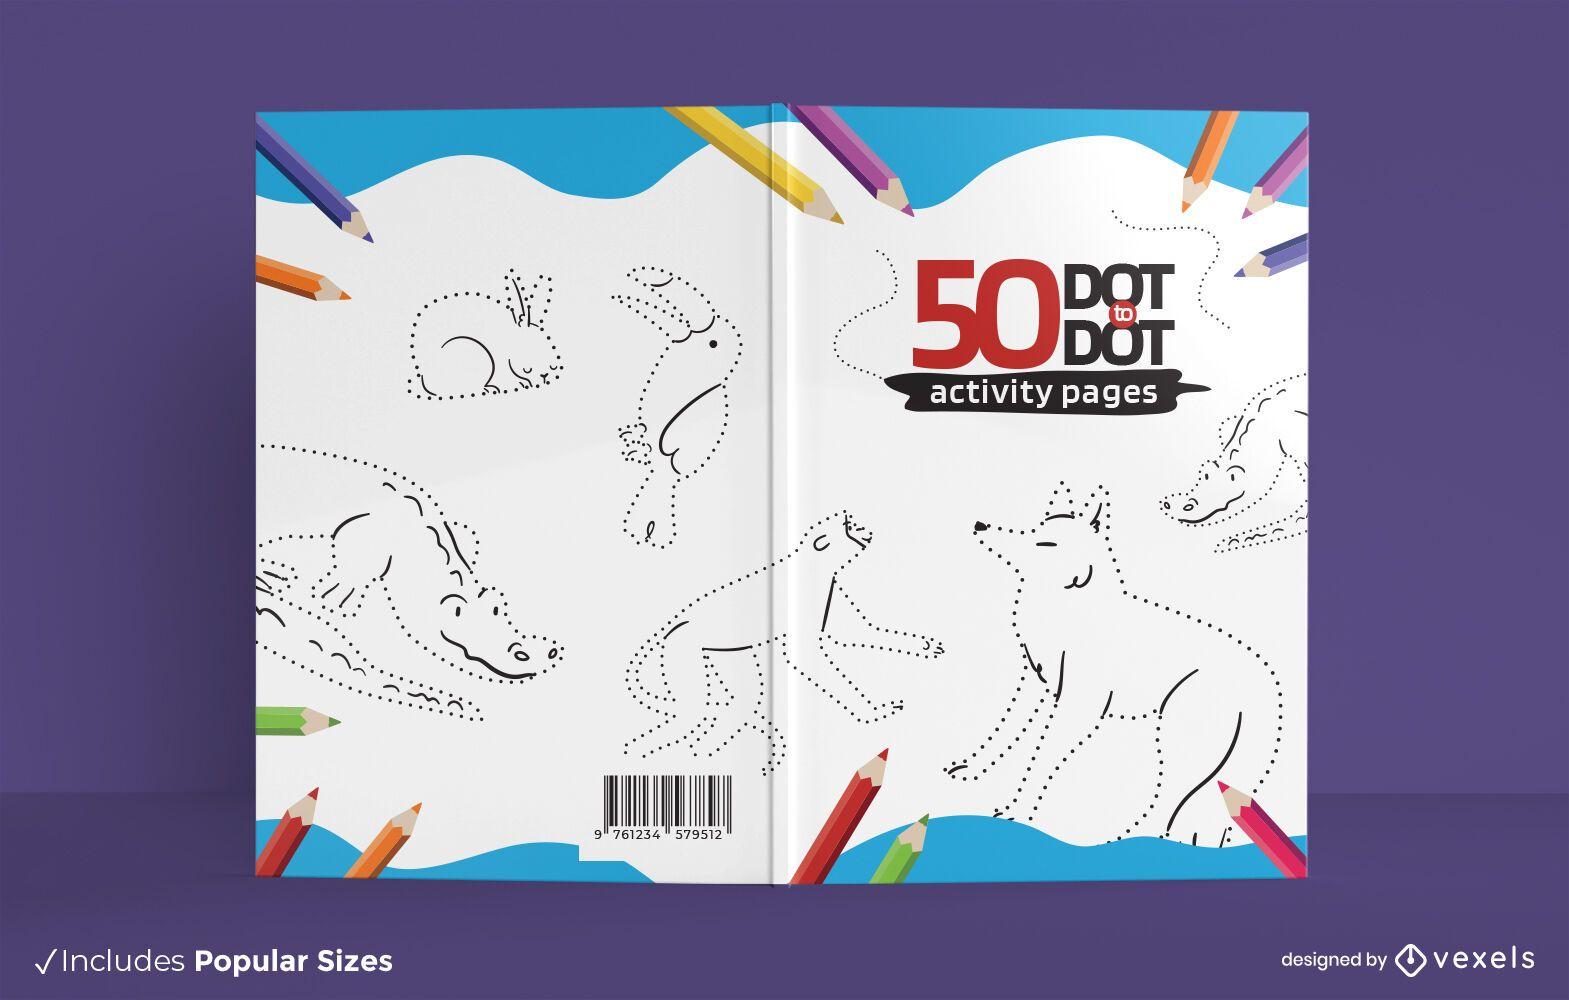 Animales punto a punto diseño de portada de libro.